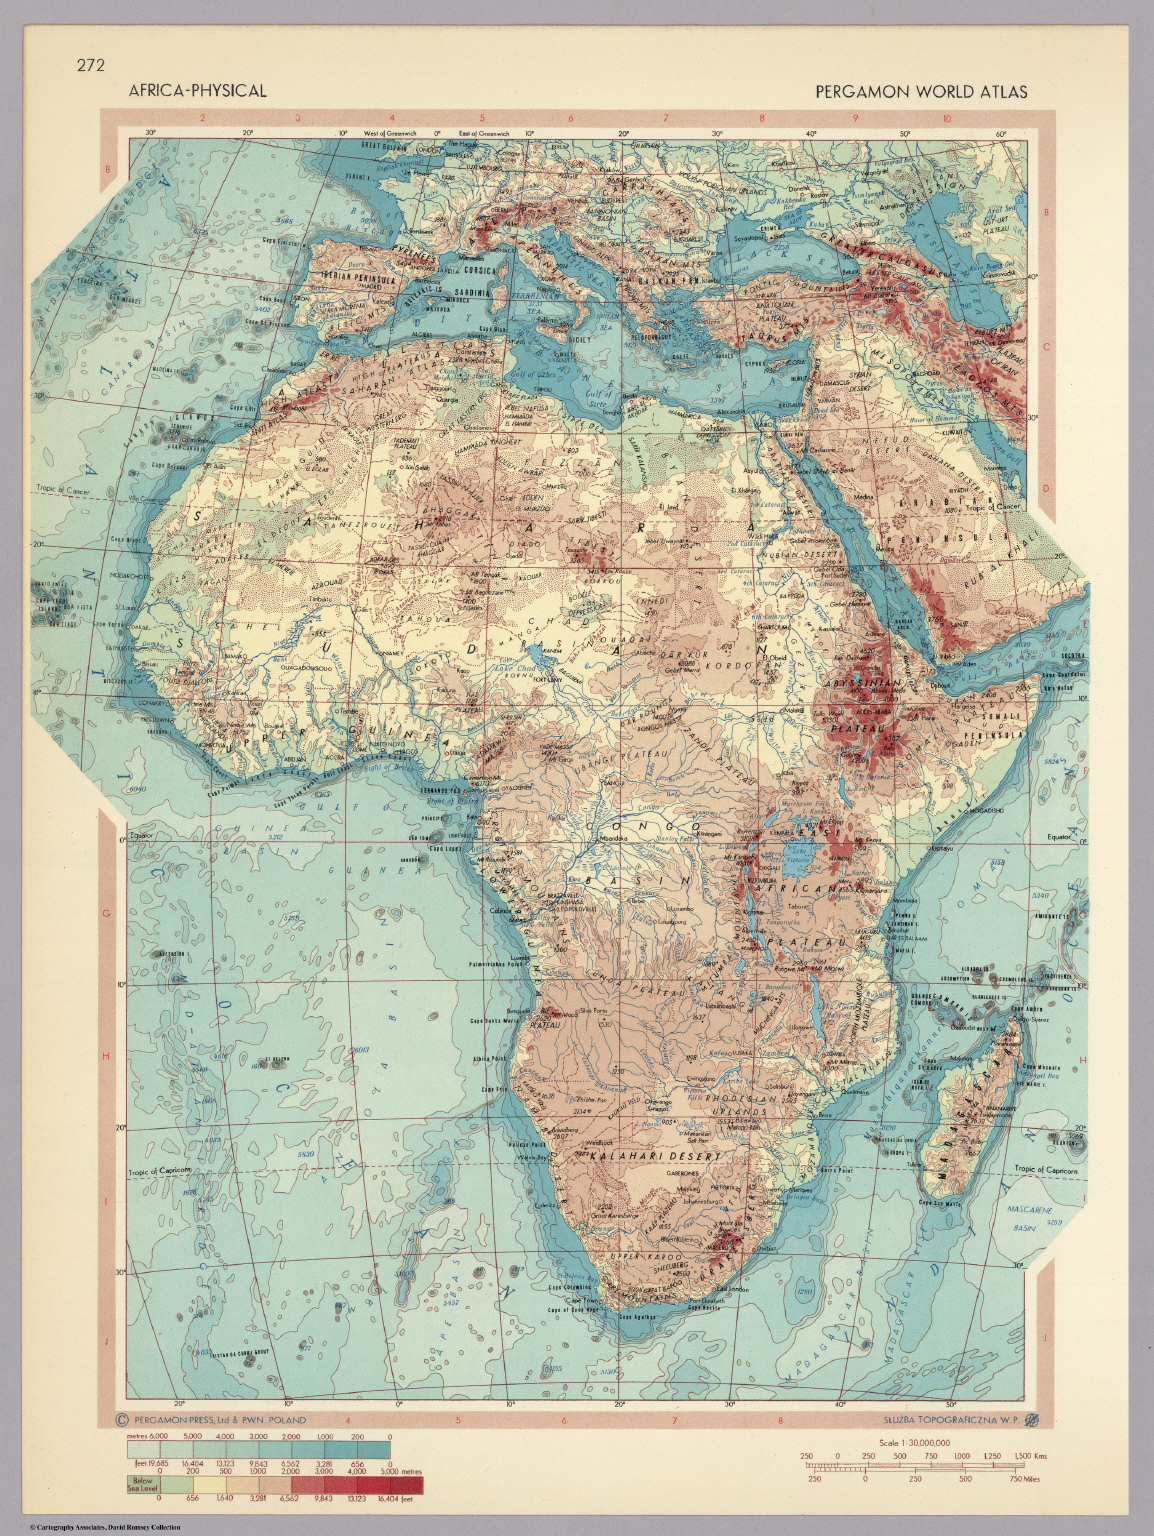 Africa physical pergamon world atlas david rumsey historical africa physical pergamon world atlas gumiabroncs Image collections